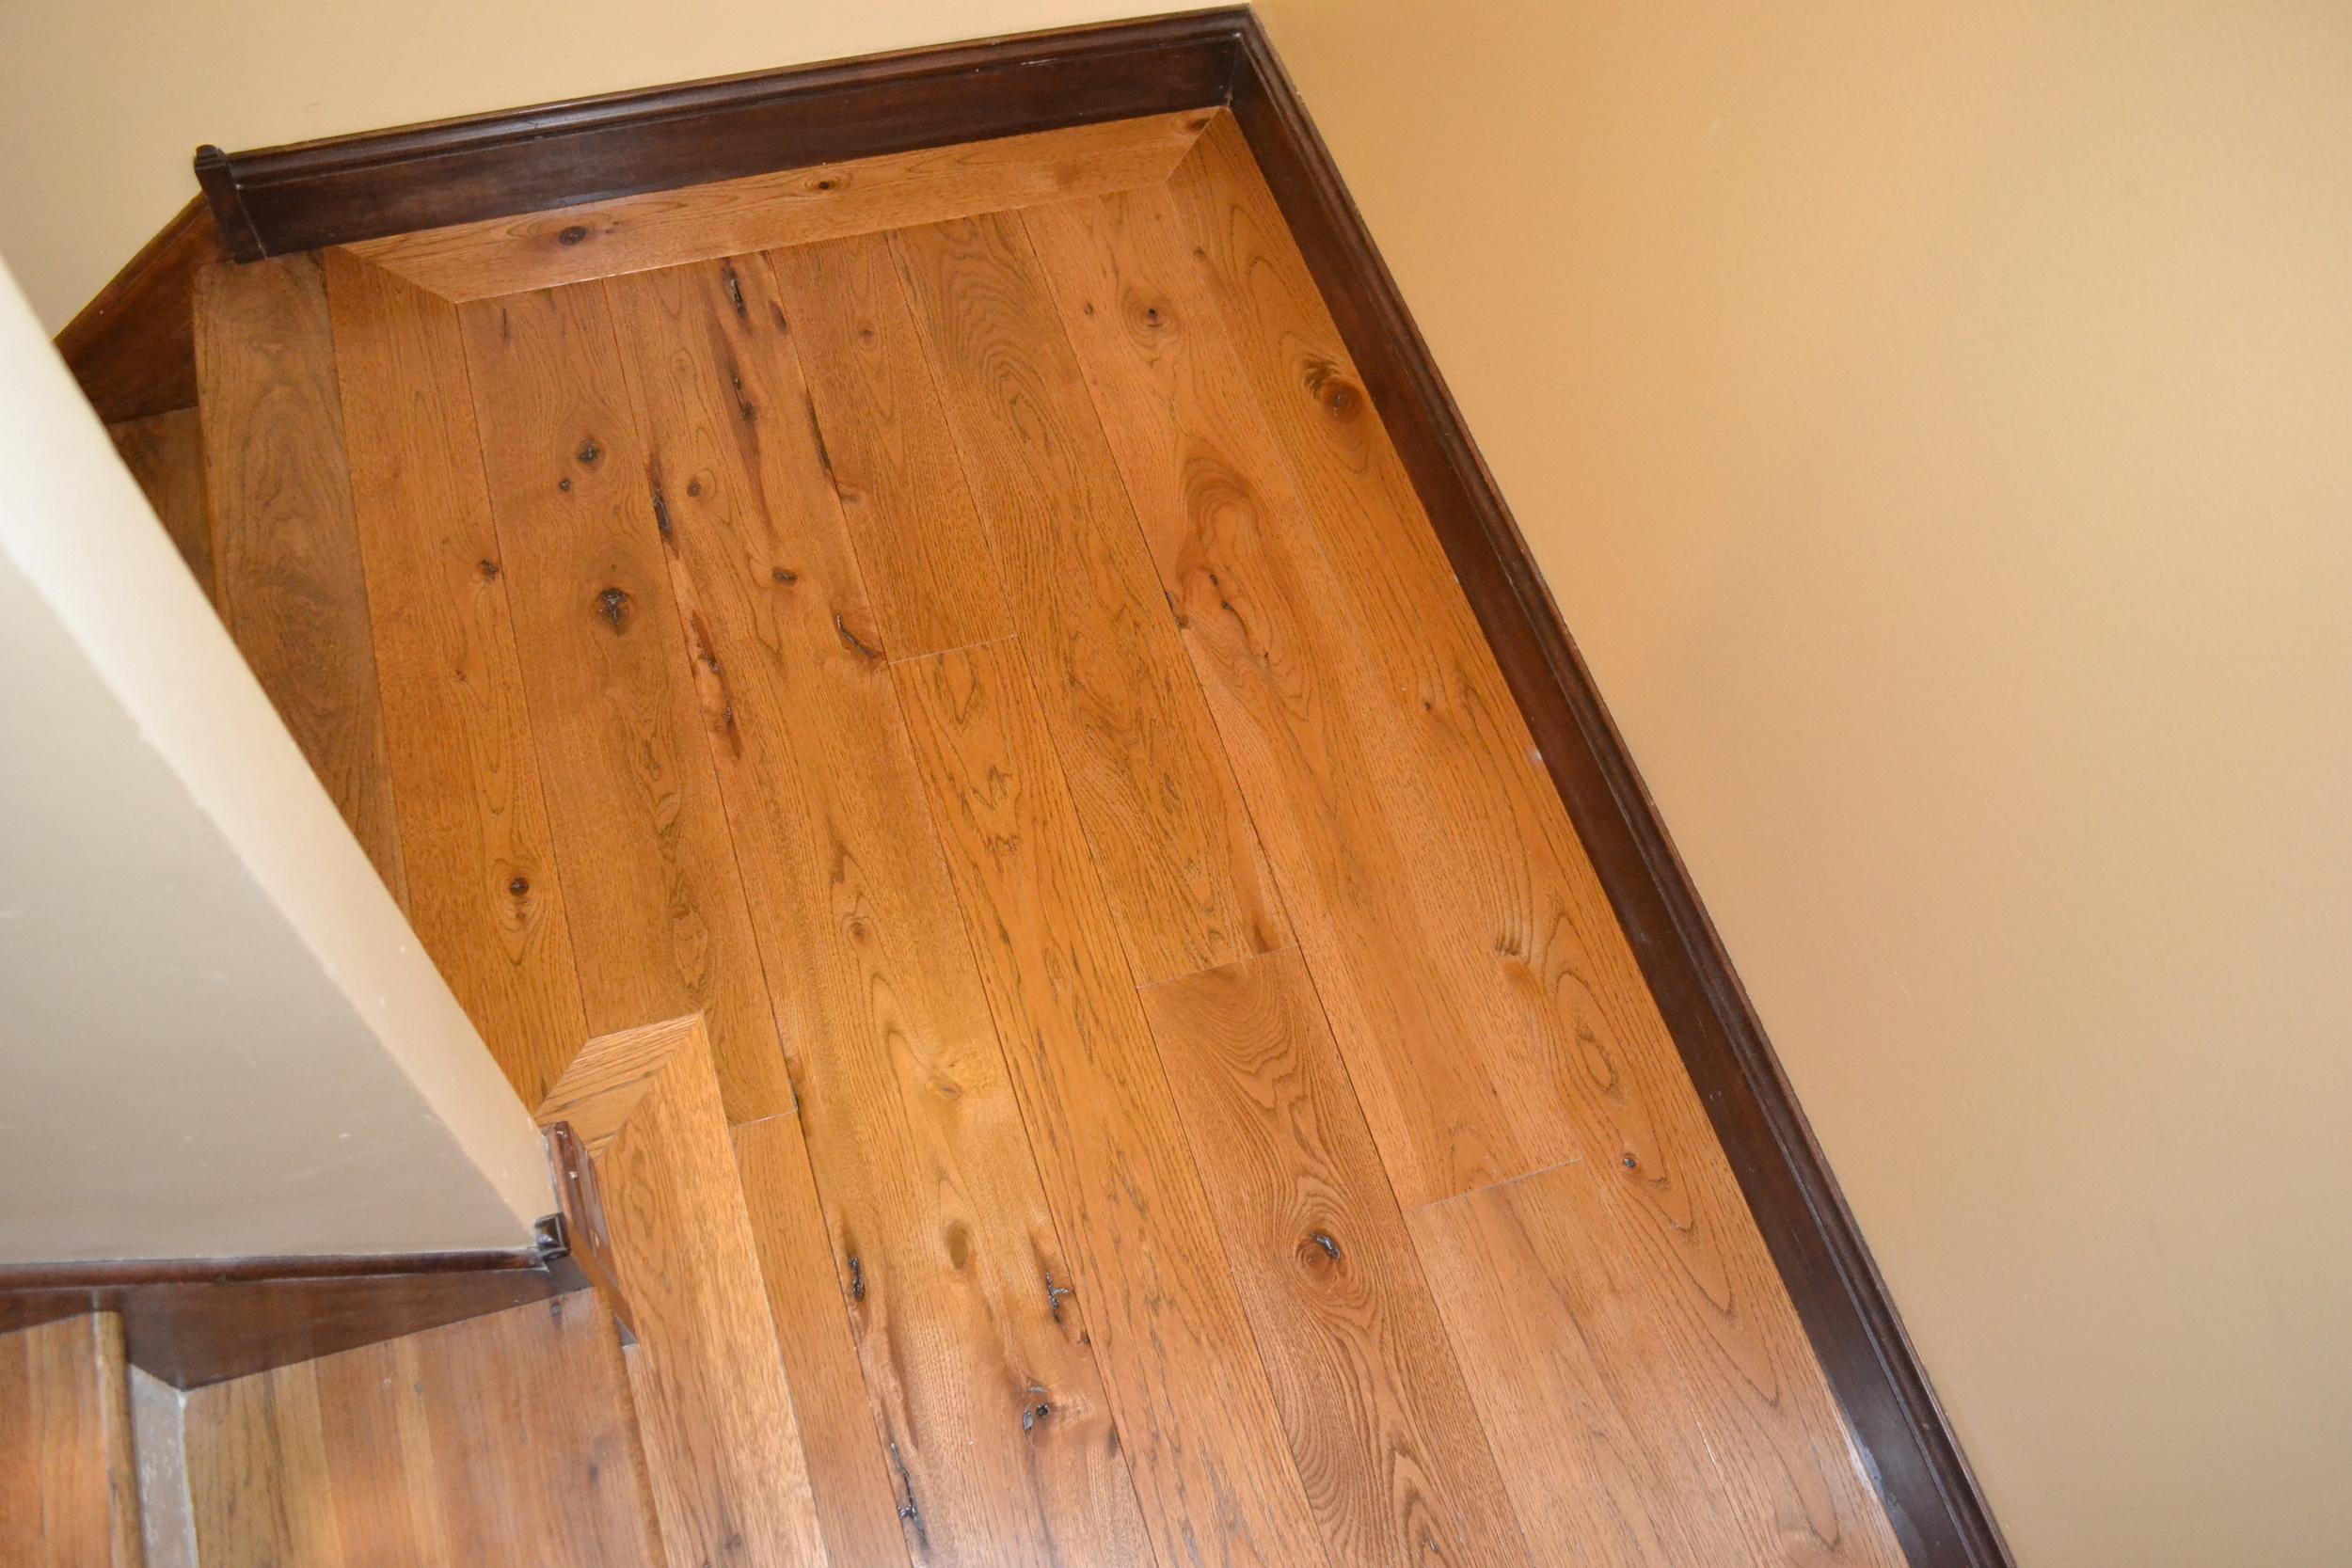 Hickory border around hickory flooring